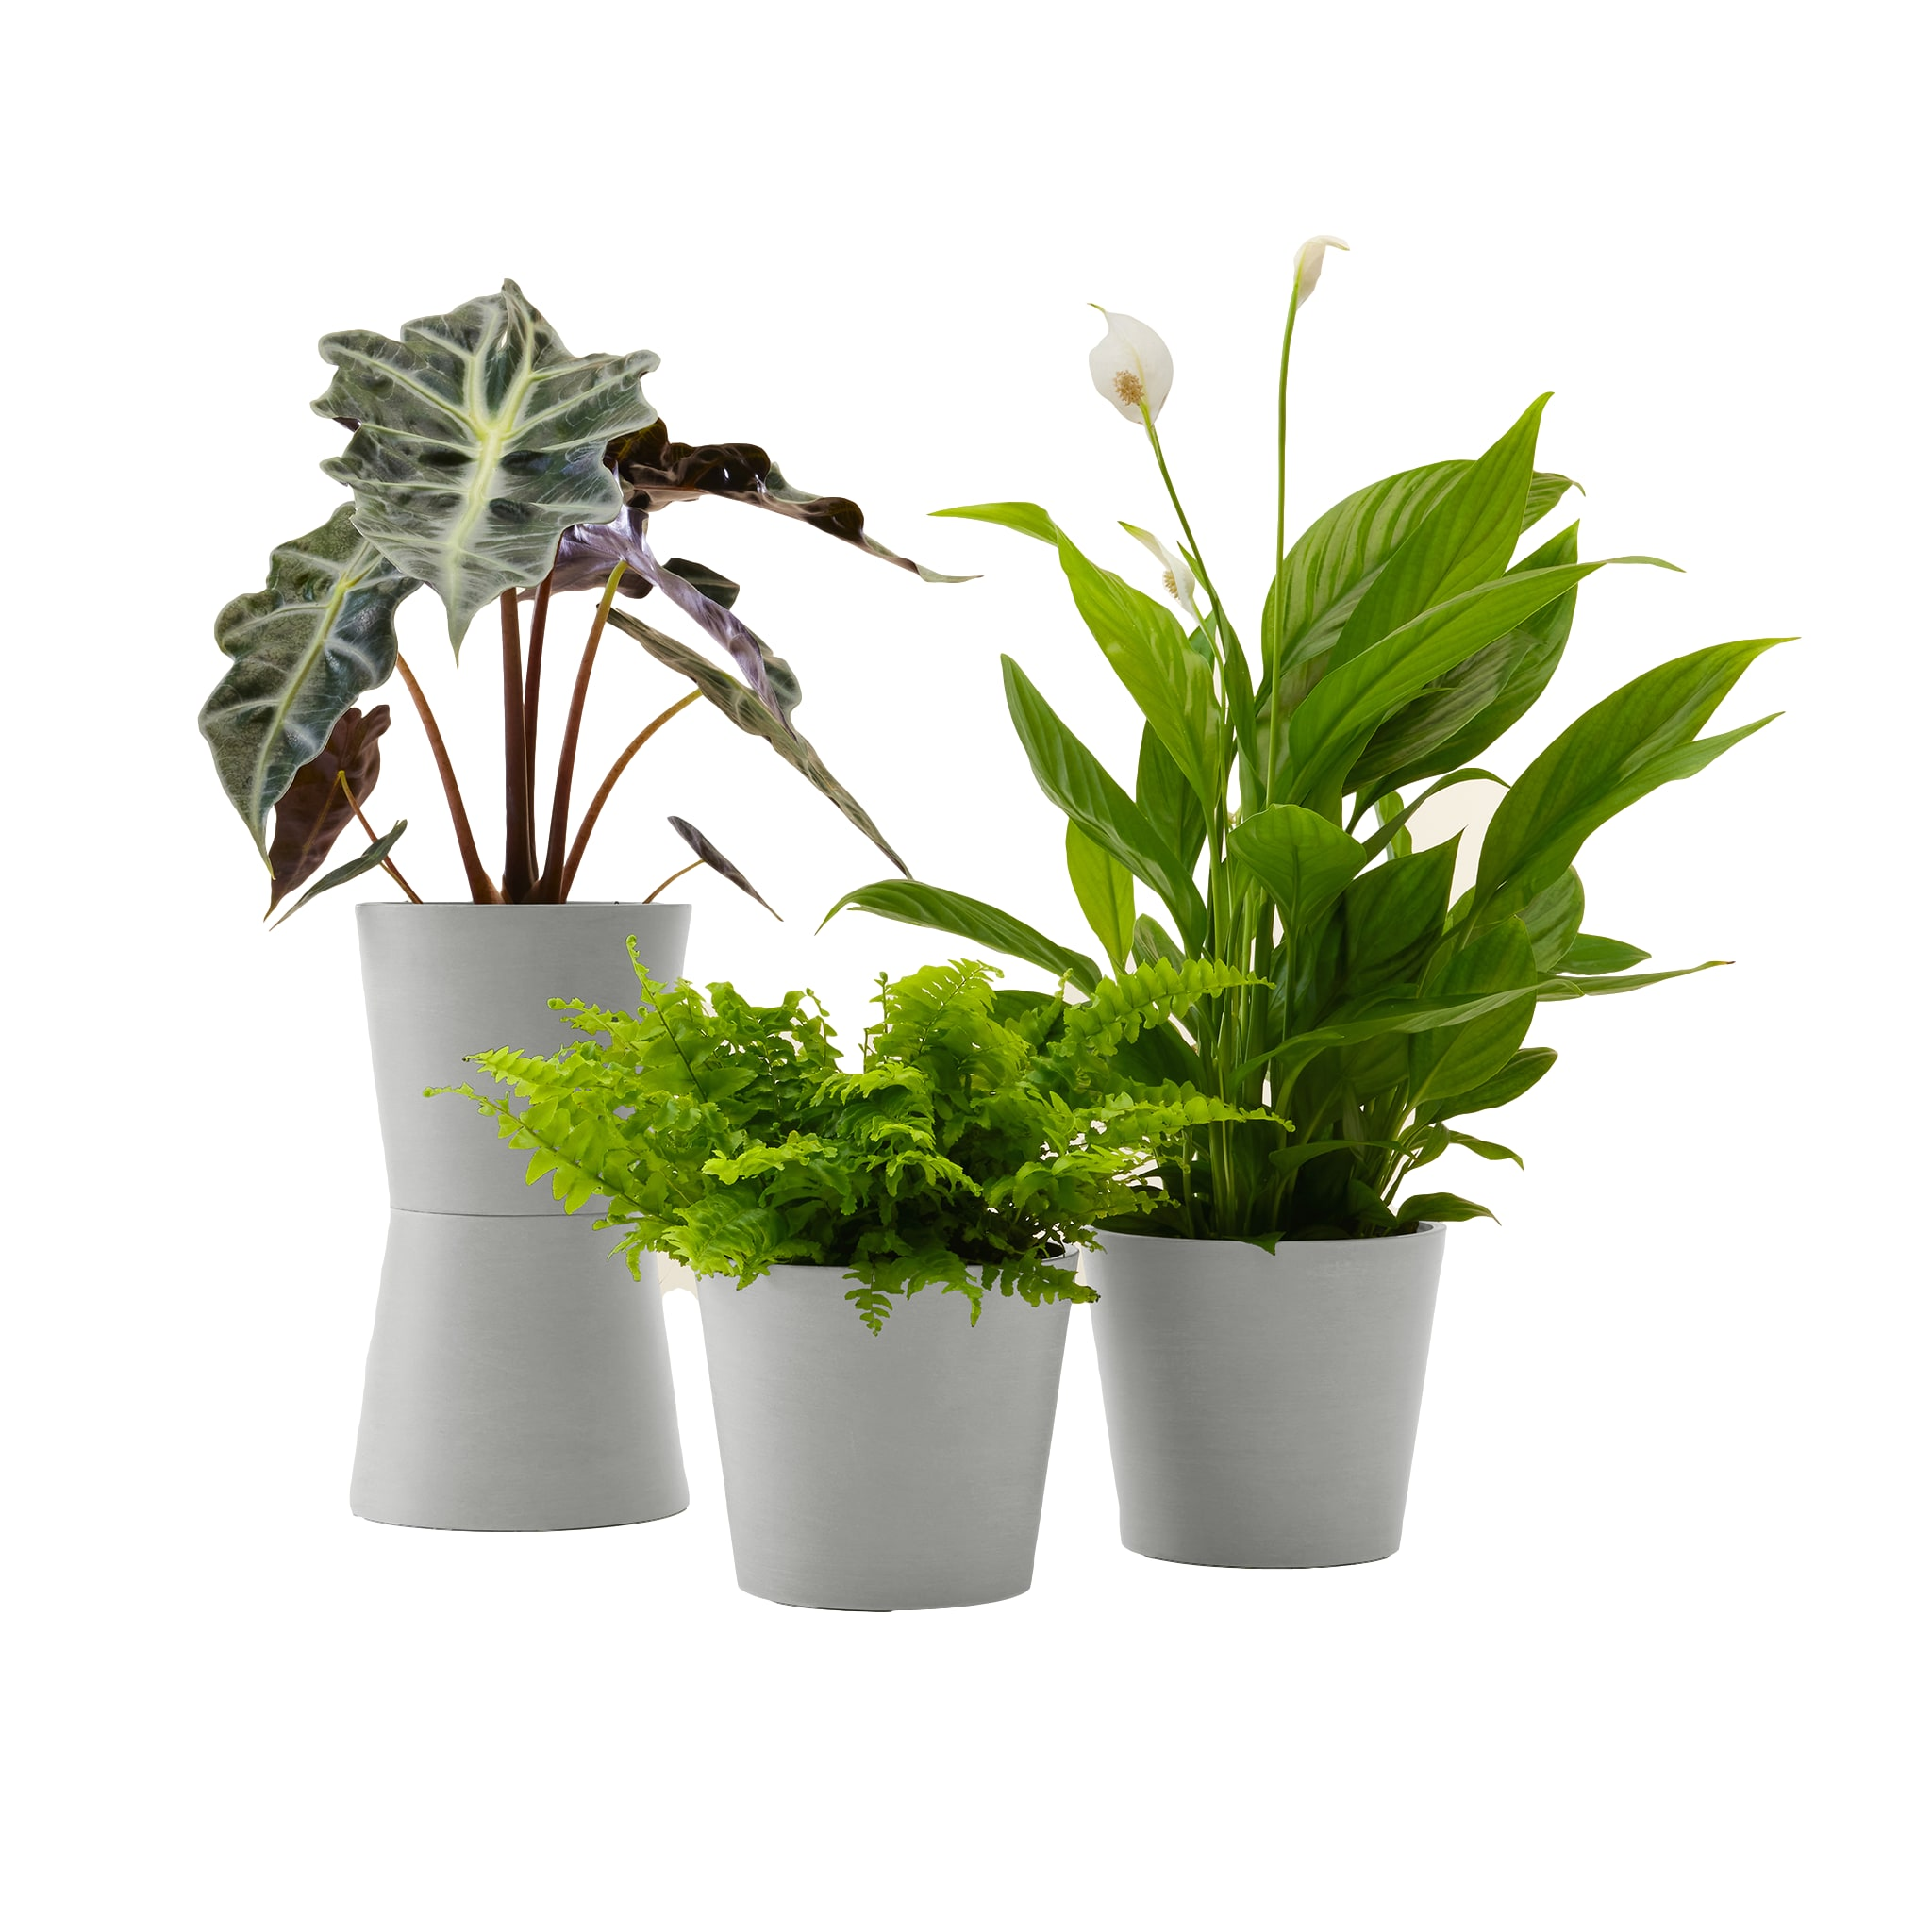 Plante - Spathiphyllum, Bananier, Nephrolepis pot blanc gris